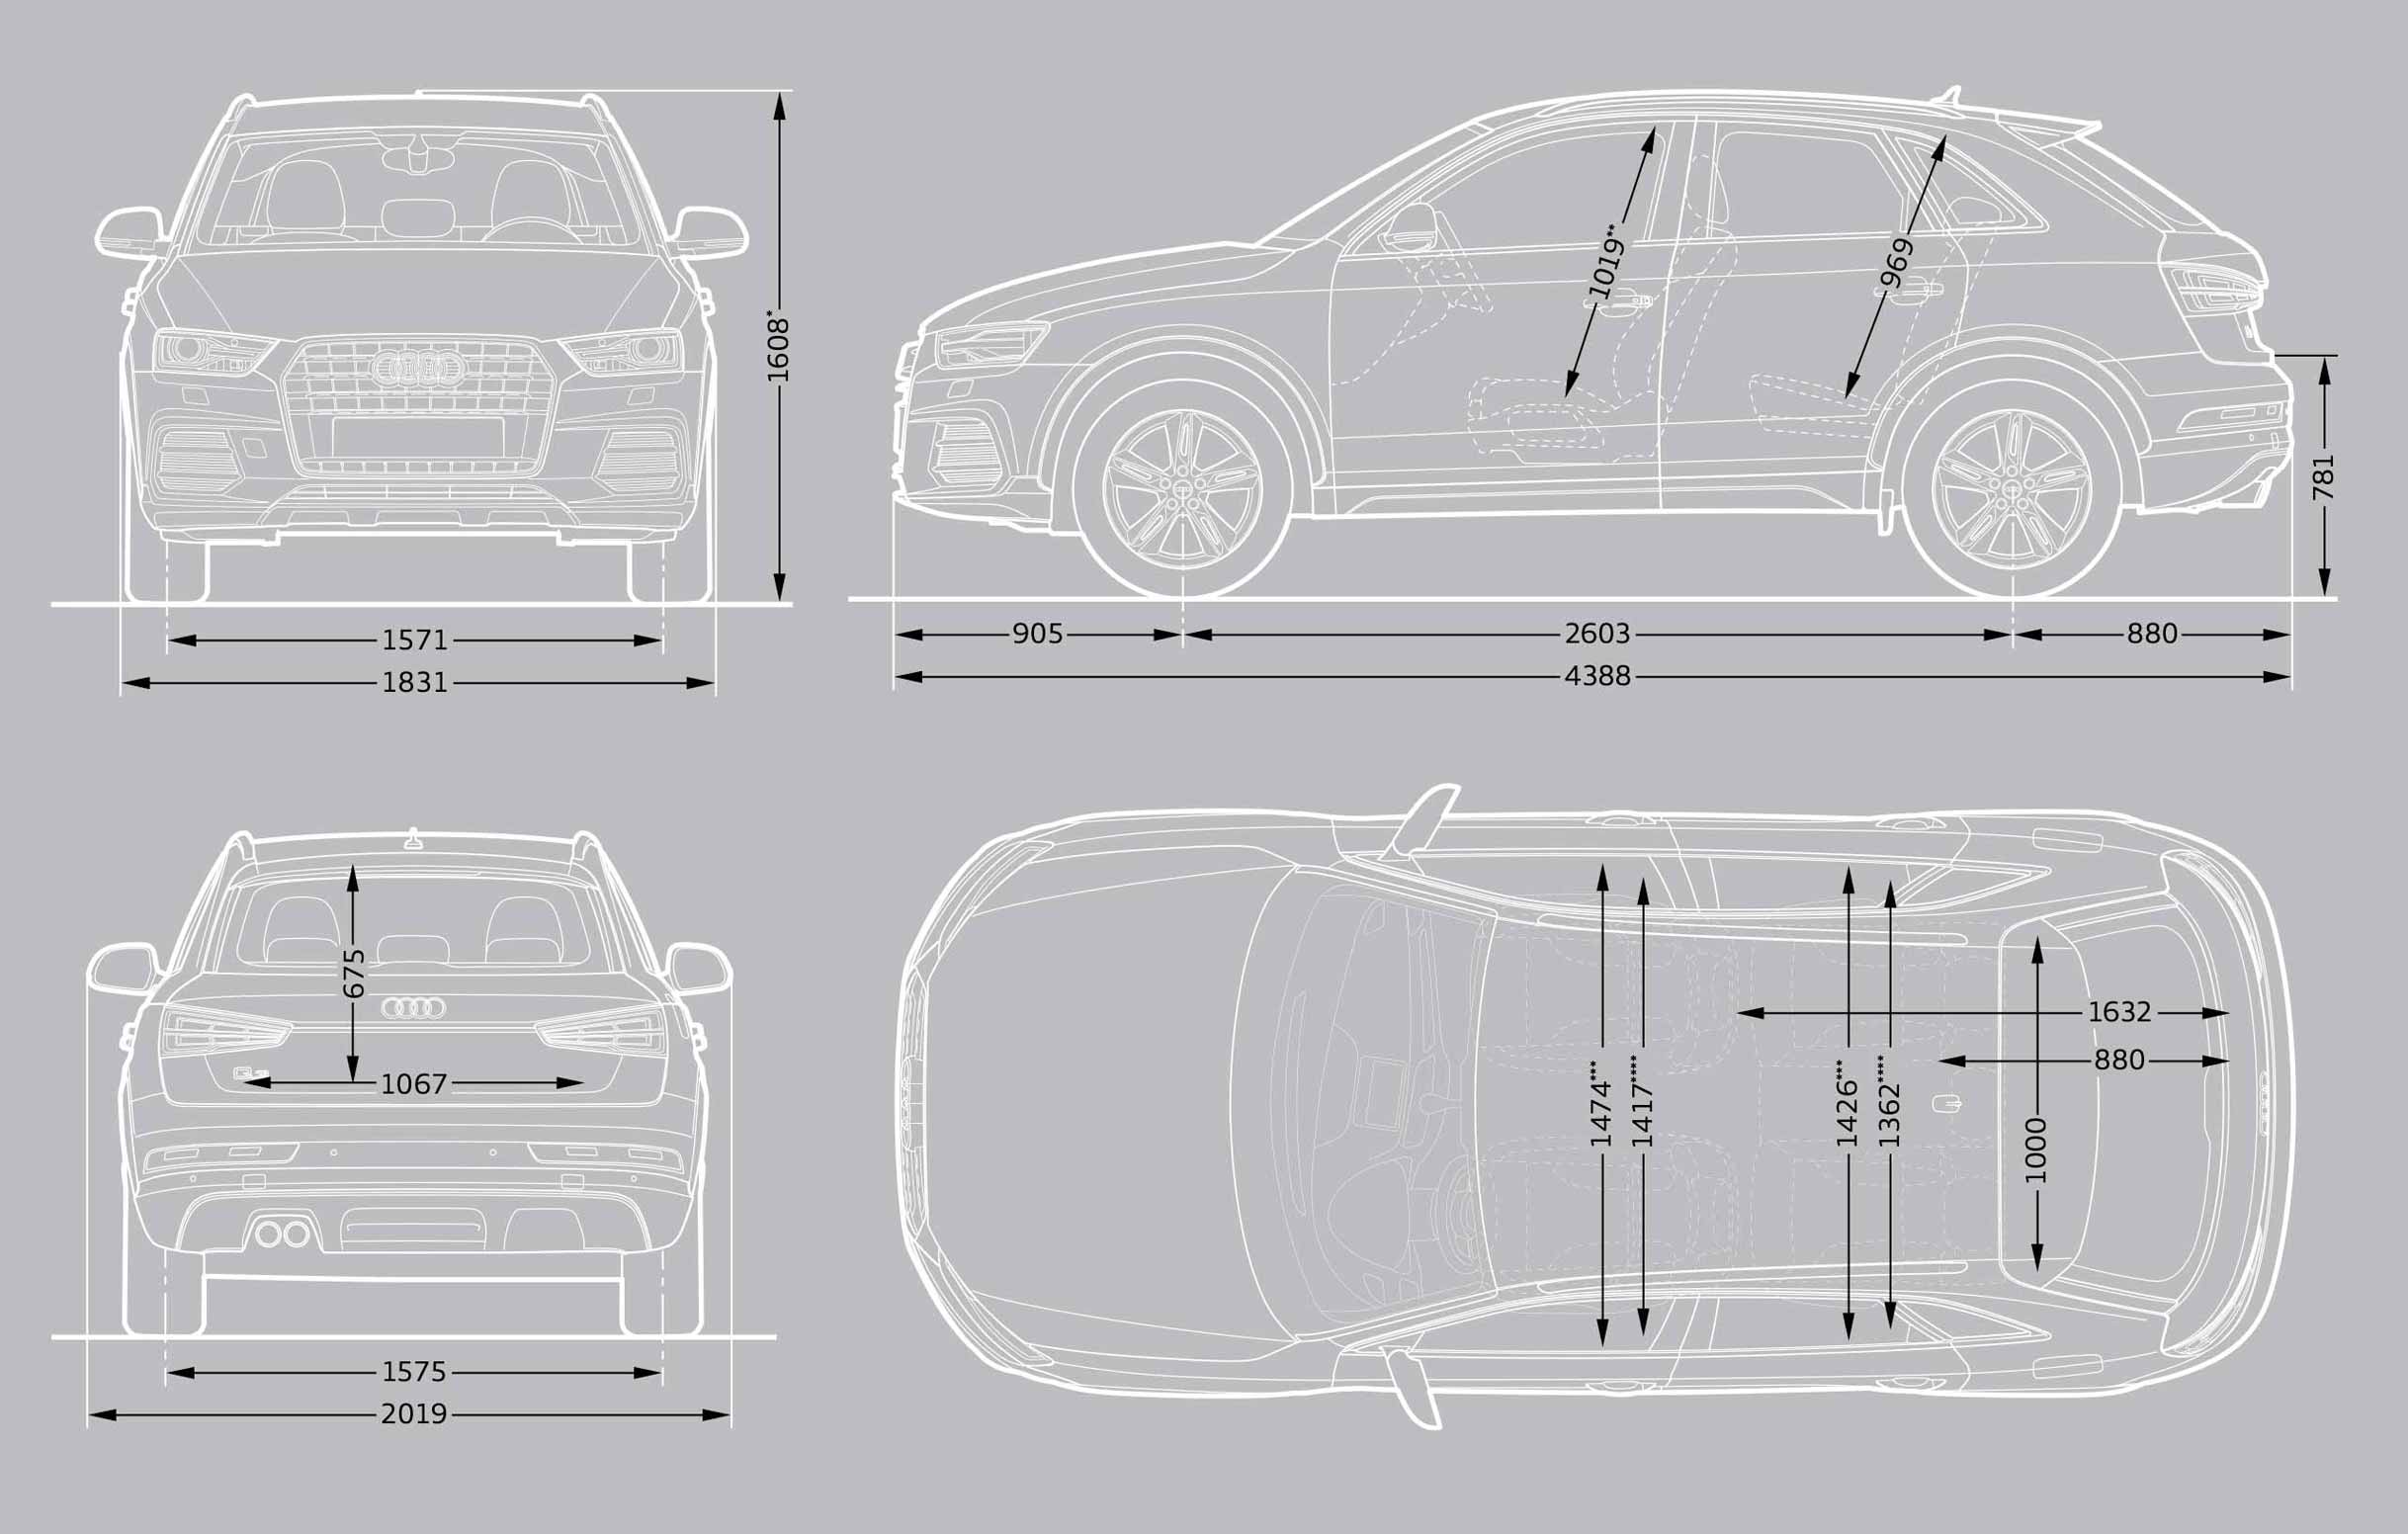 Dimensions Q7 Dimensions Audi Cyprus Audi Q7 1 Fiche